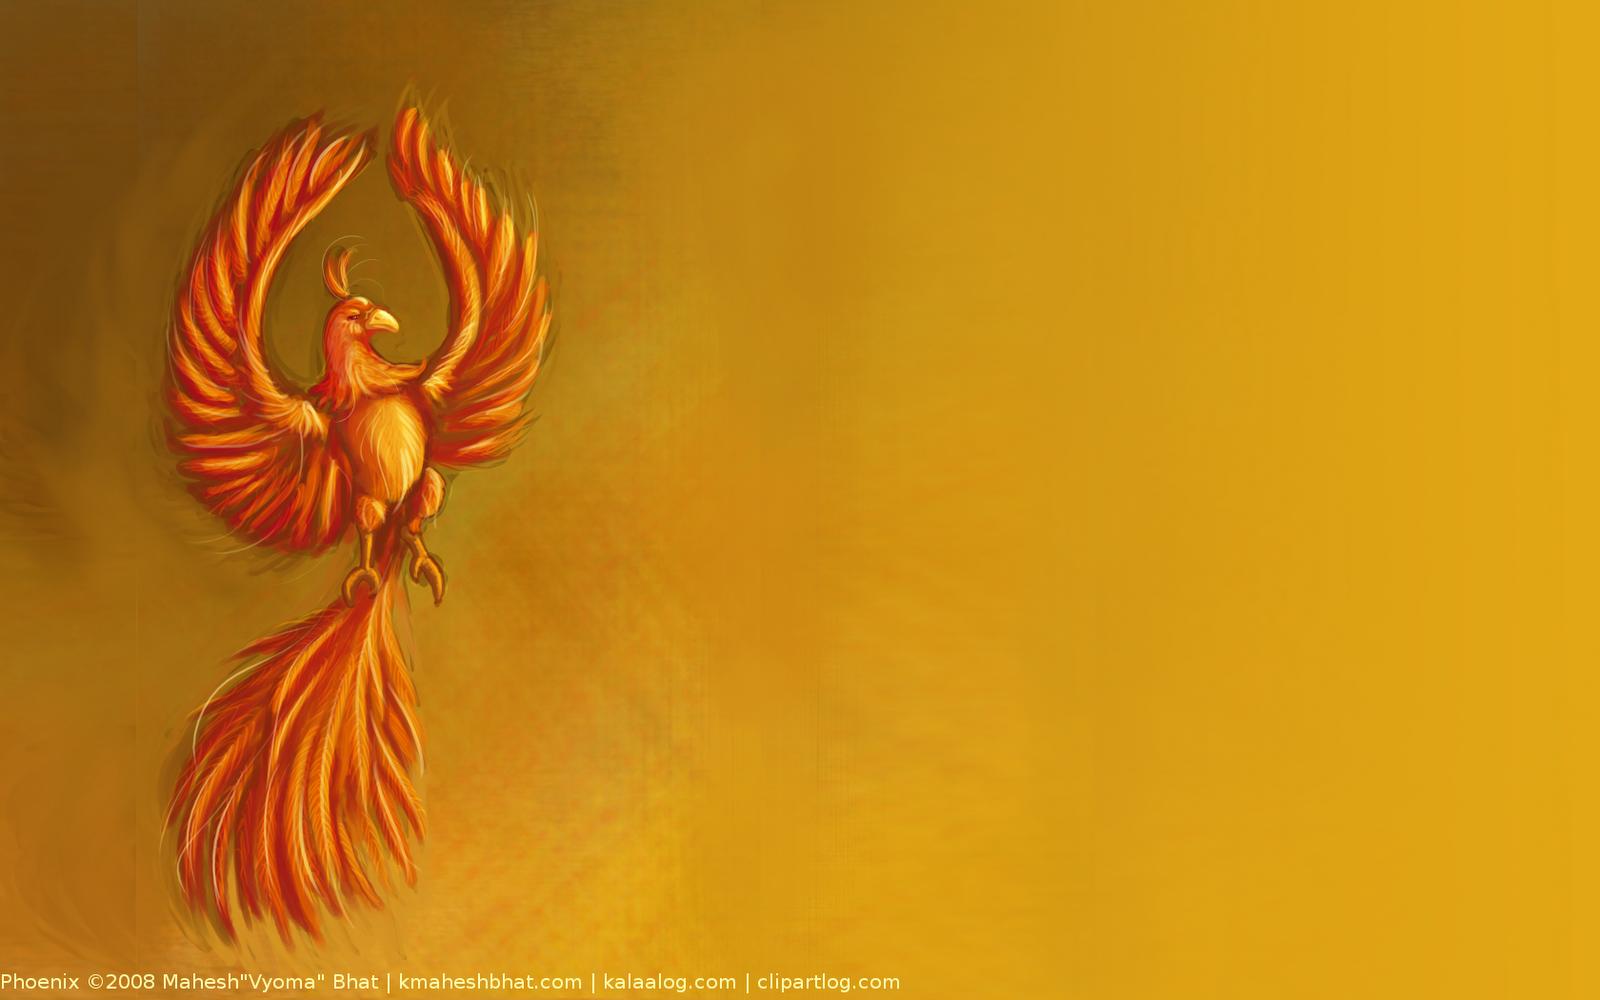 phoenix wallpaper 3 phoenix wallpaper 4 phoenix wallpaper 5 phoenix 1600x1000